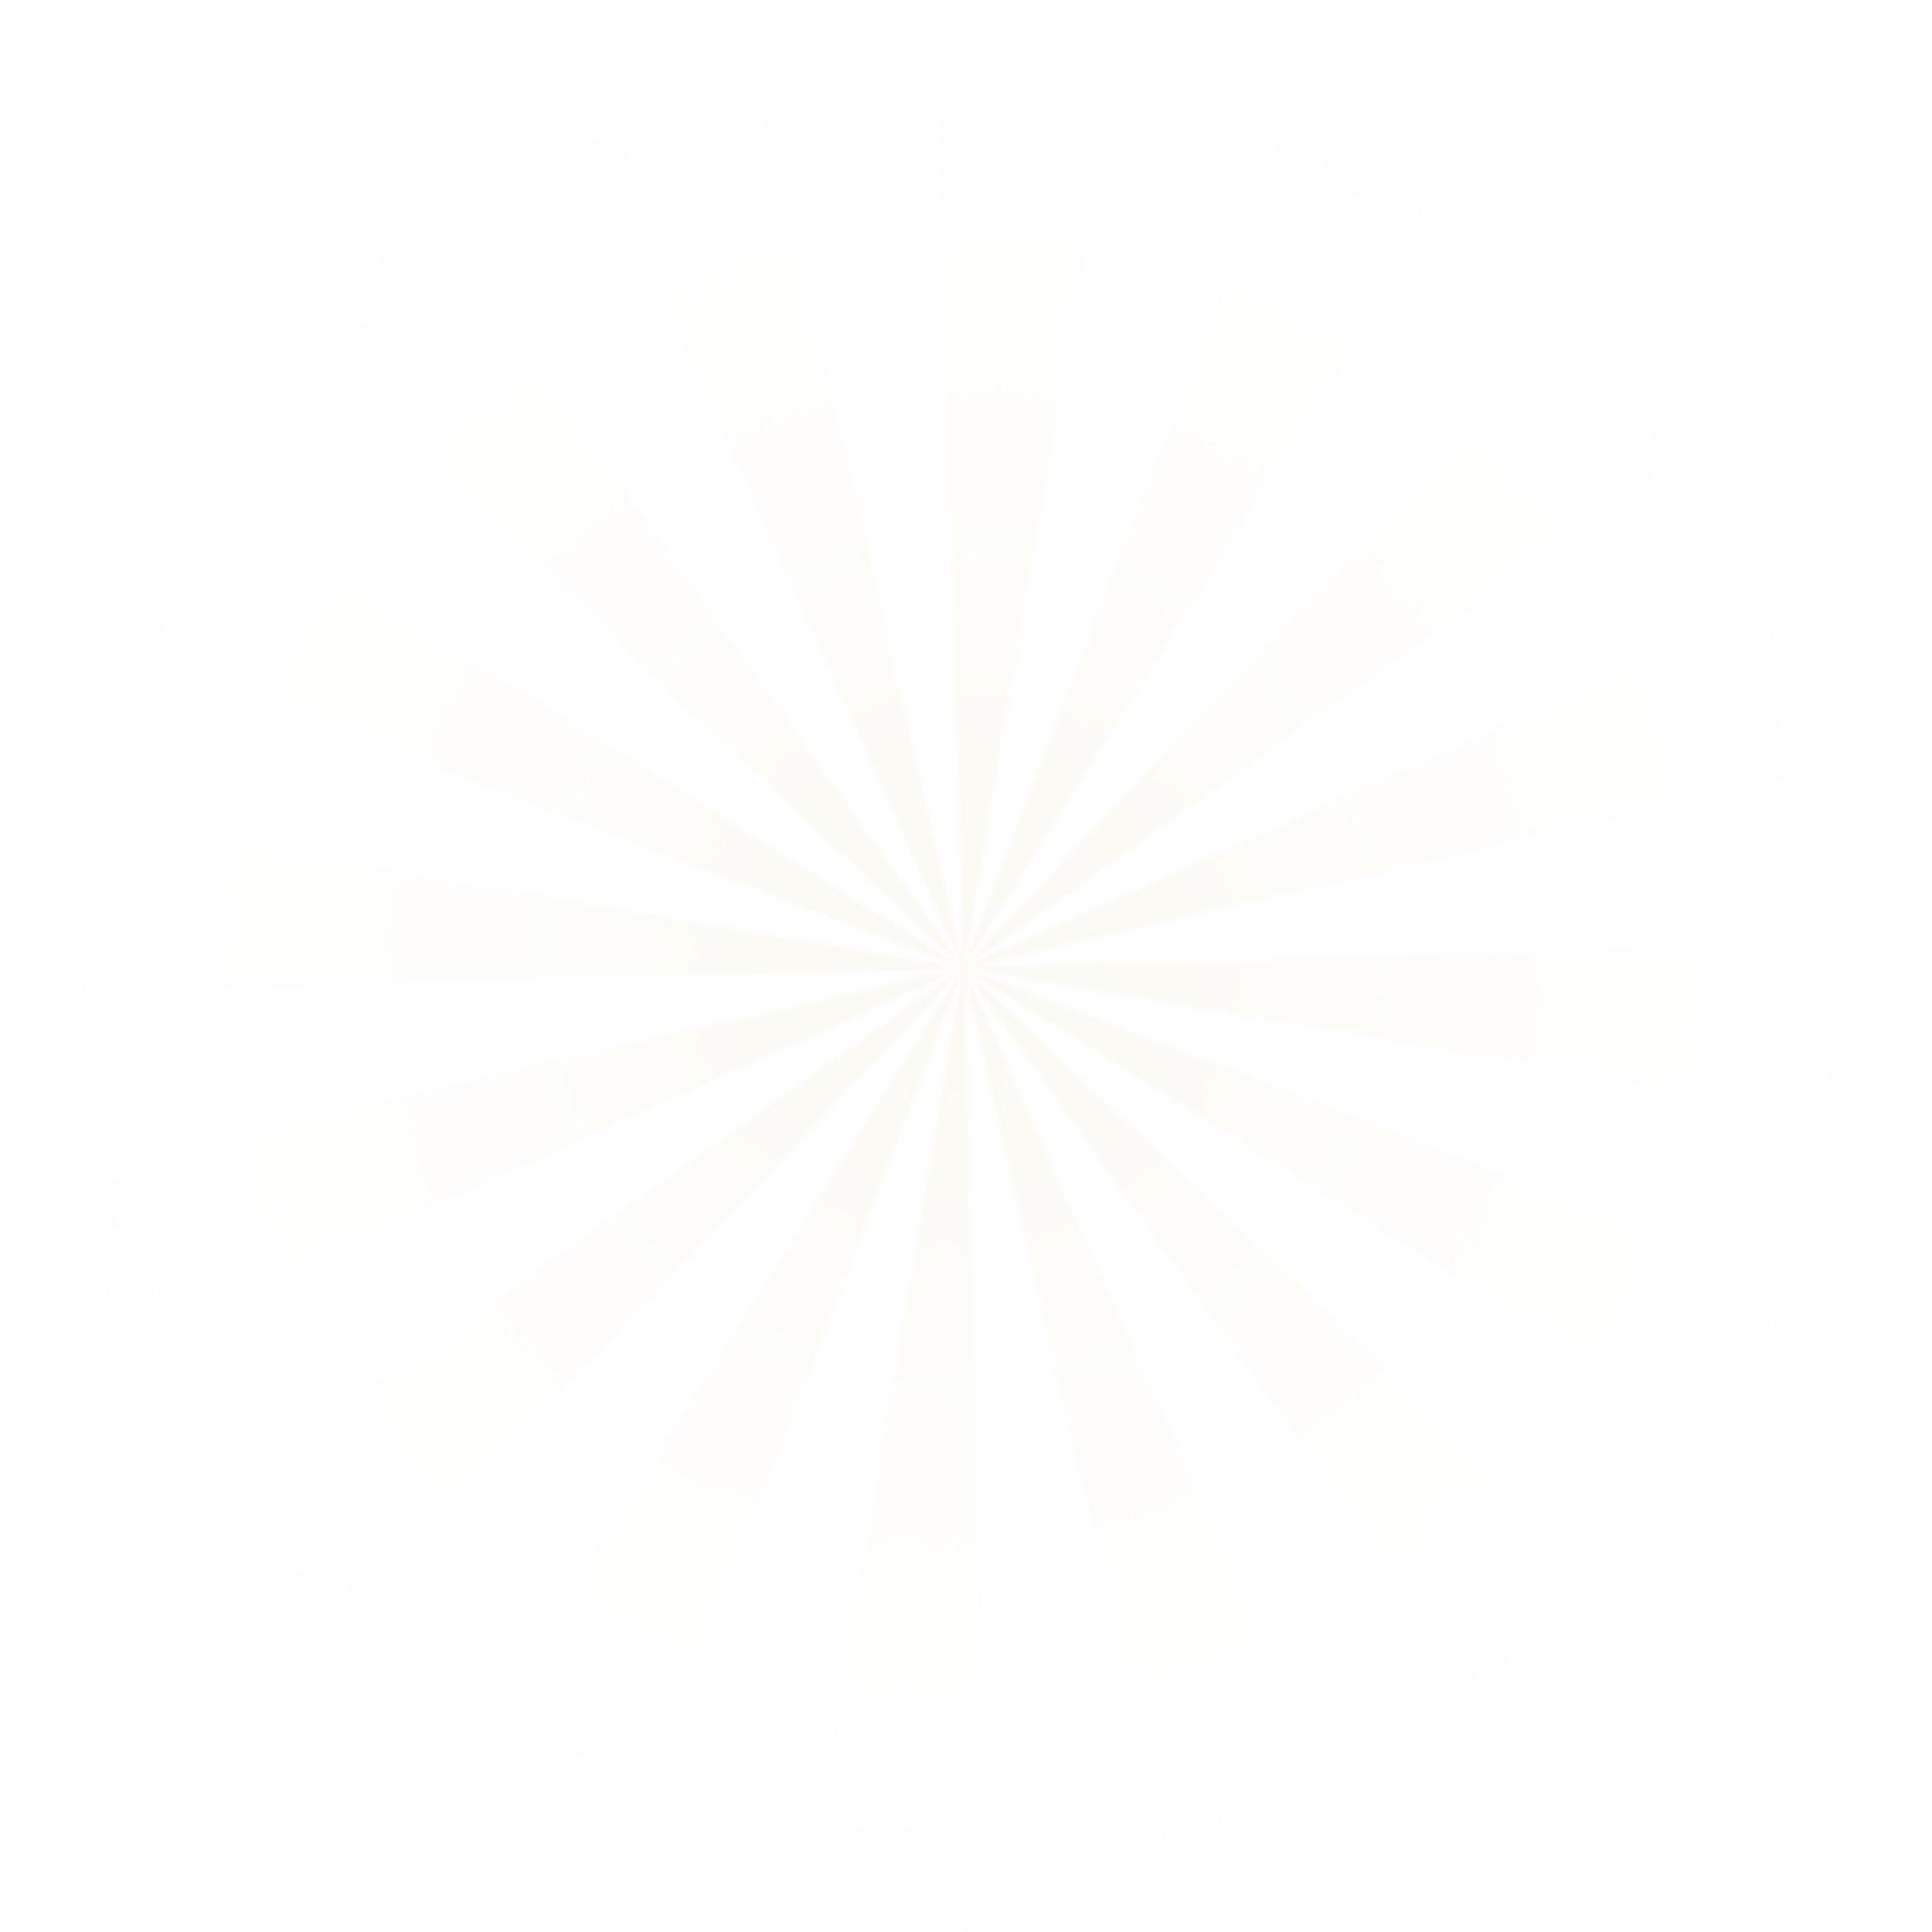 Rayos de sol png transparente 4 » PNG Image.